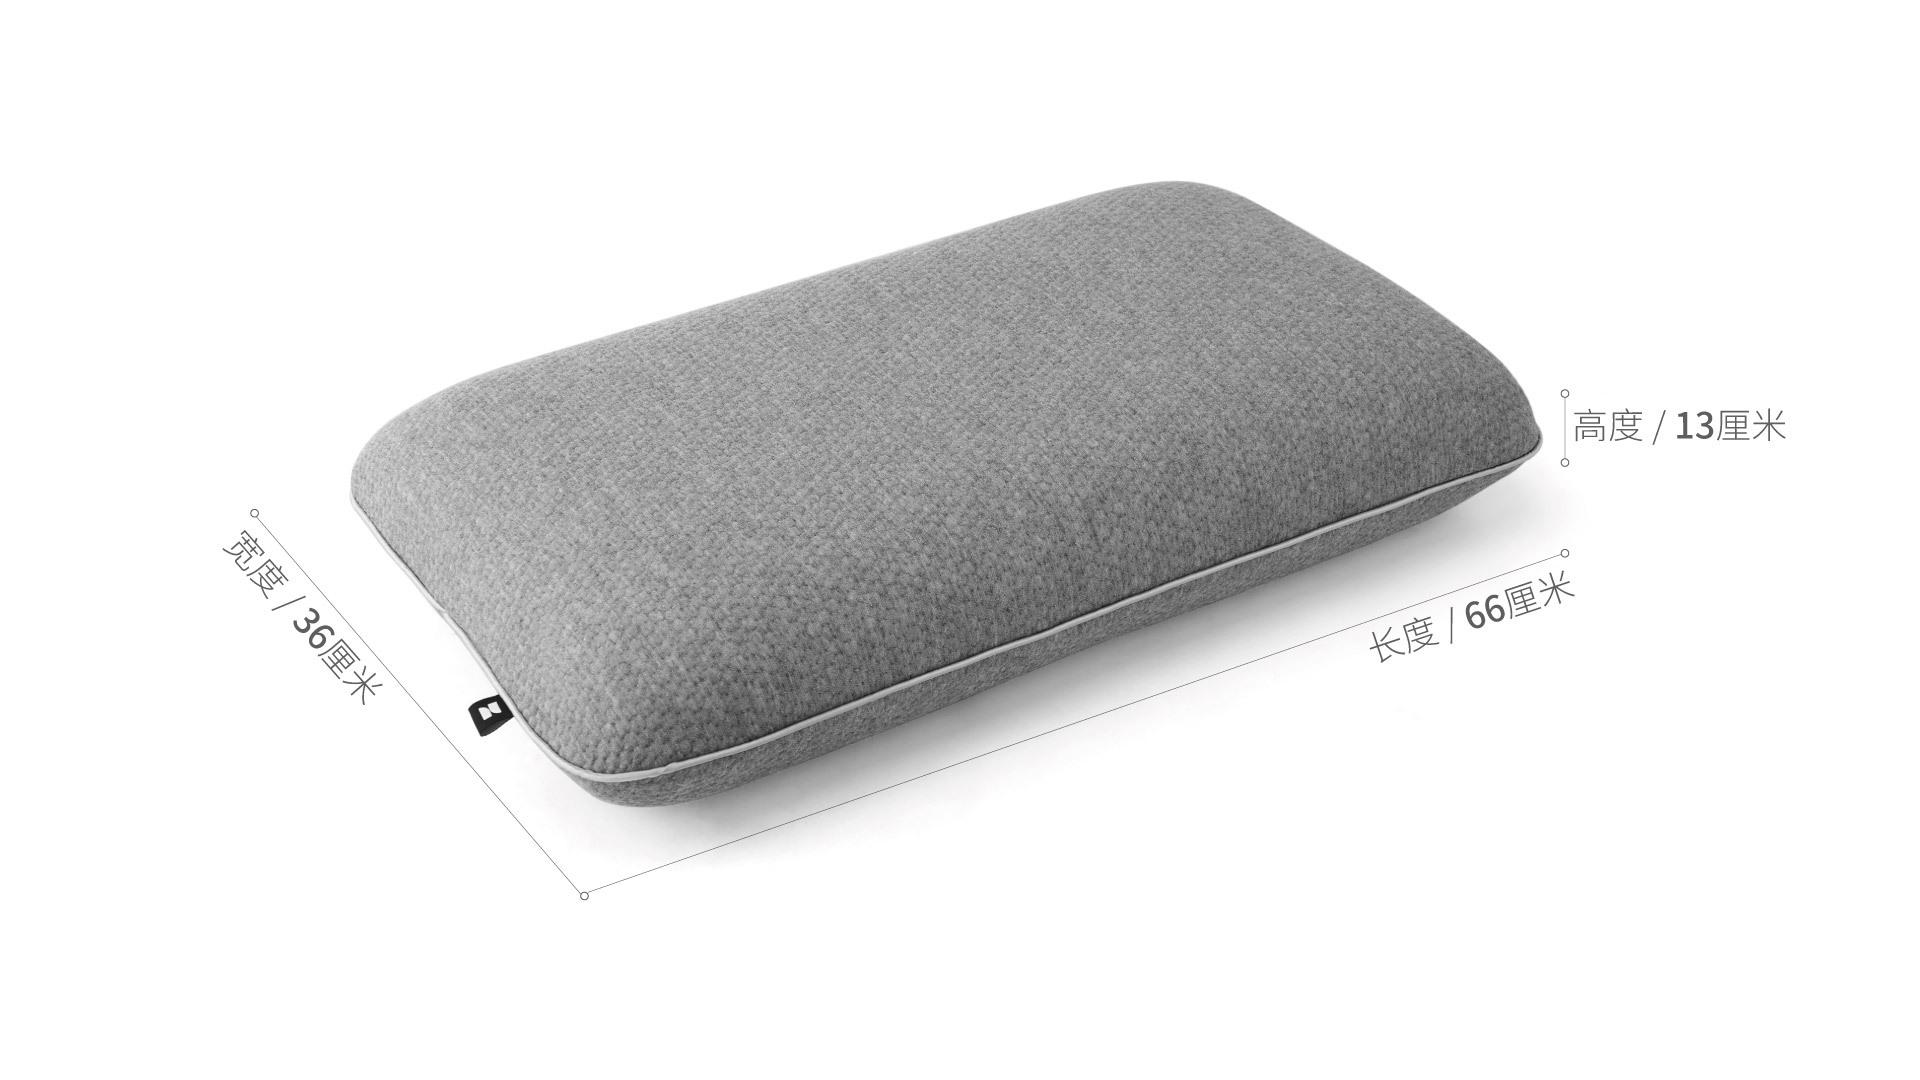 pH7号平衡亲水棉枕PH7号亲肤枕床·床具效果图